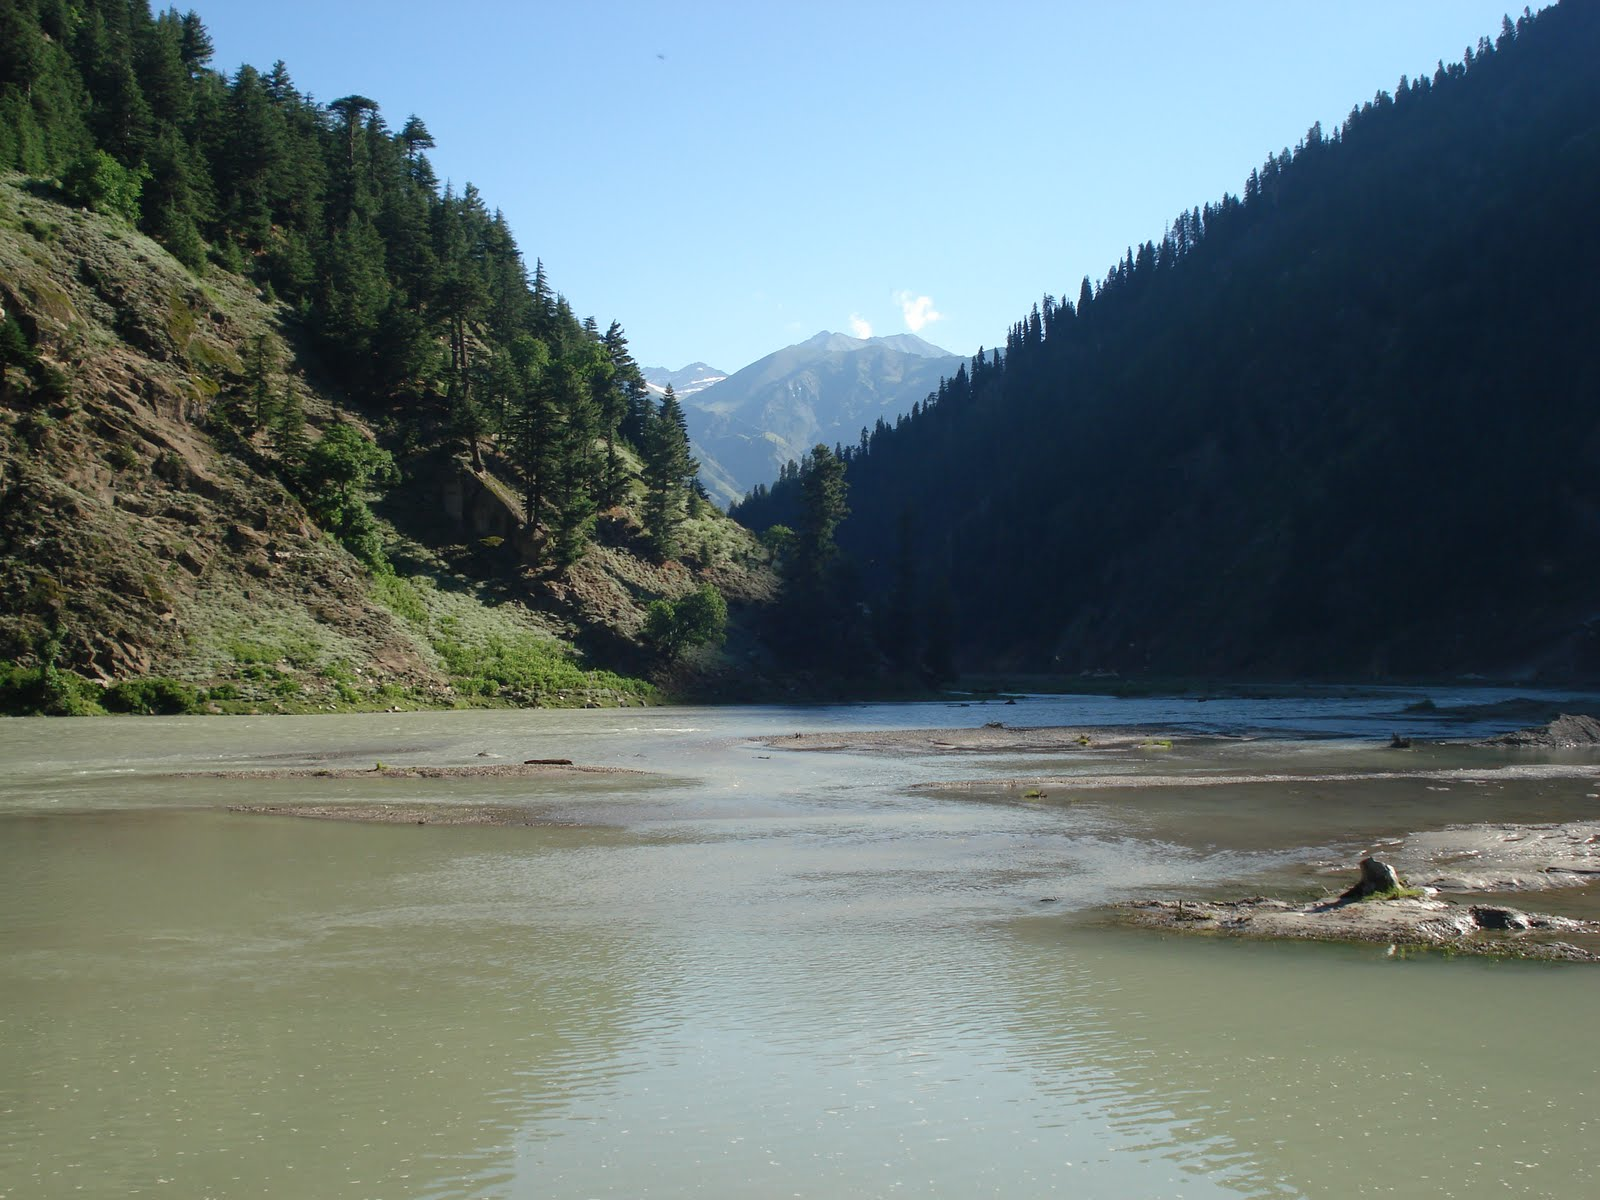 http://3.bp.blogspot.com/-4BdaDcMm2pE/TfCVO55JjOI/AAAAAAAAAzs/7f69eUwG6Y4/s1600/Kunhar_river_in_Naran_valley_of_Pakistan%255B1%255D.jpg